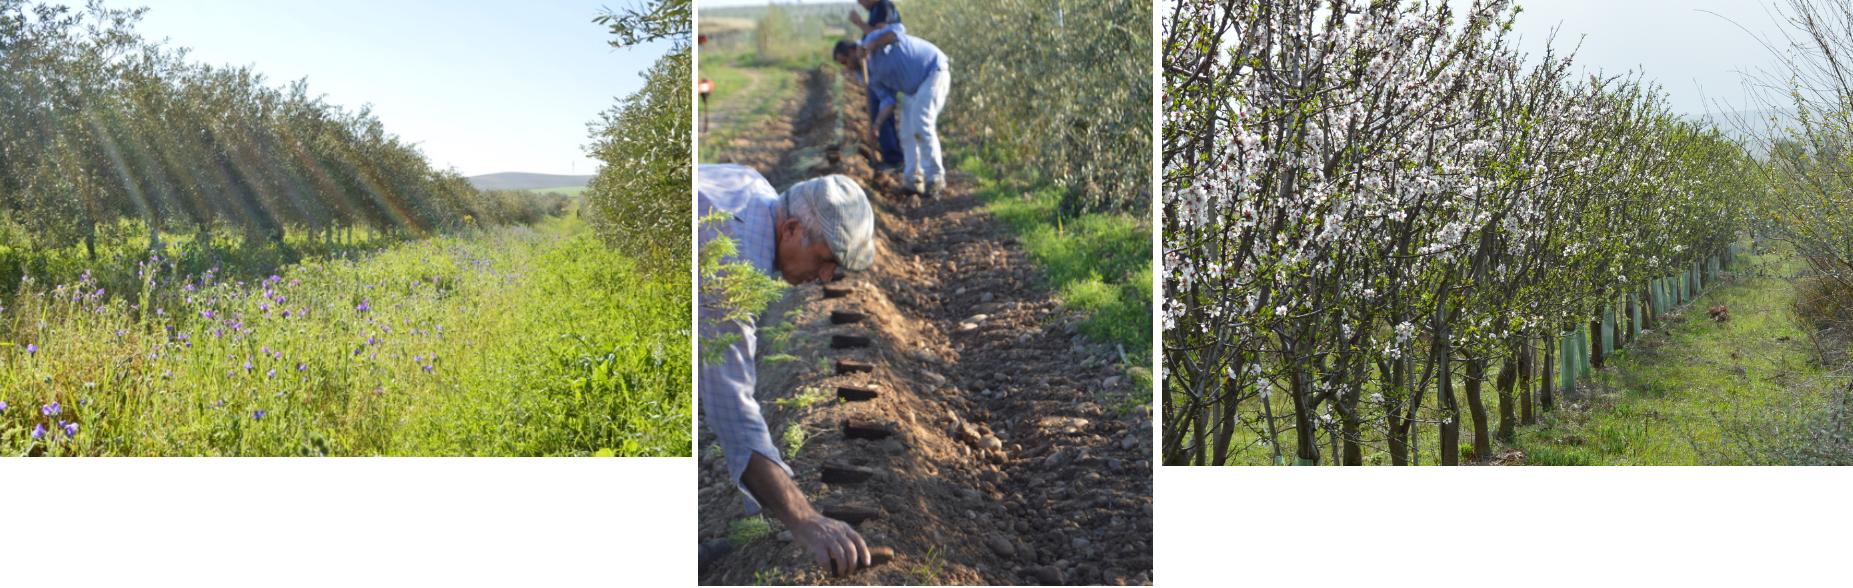 Biodynamic & organic farm cortijo el puerto spain healing supporting biodiversity environmental awareness